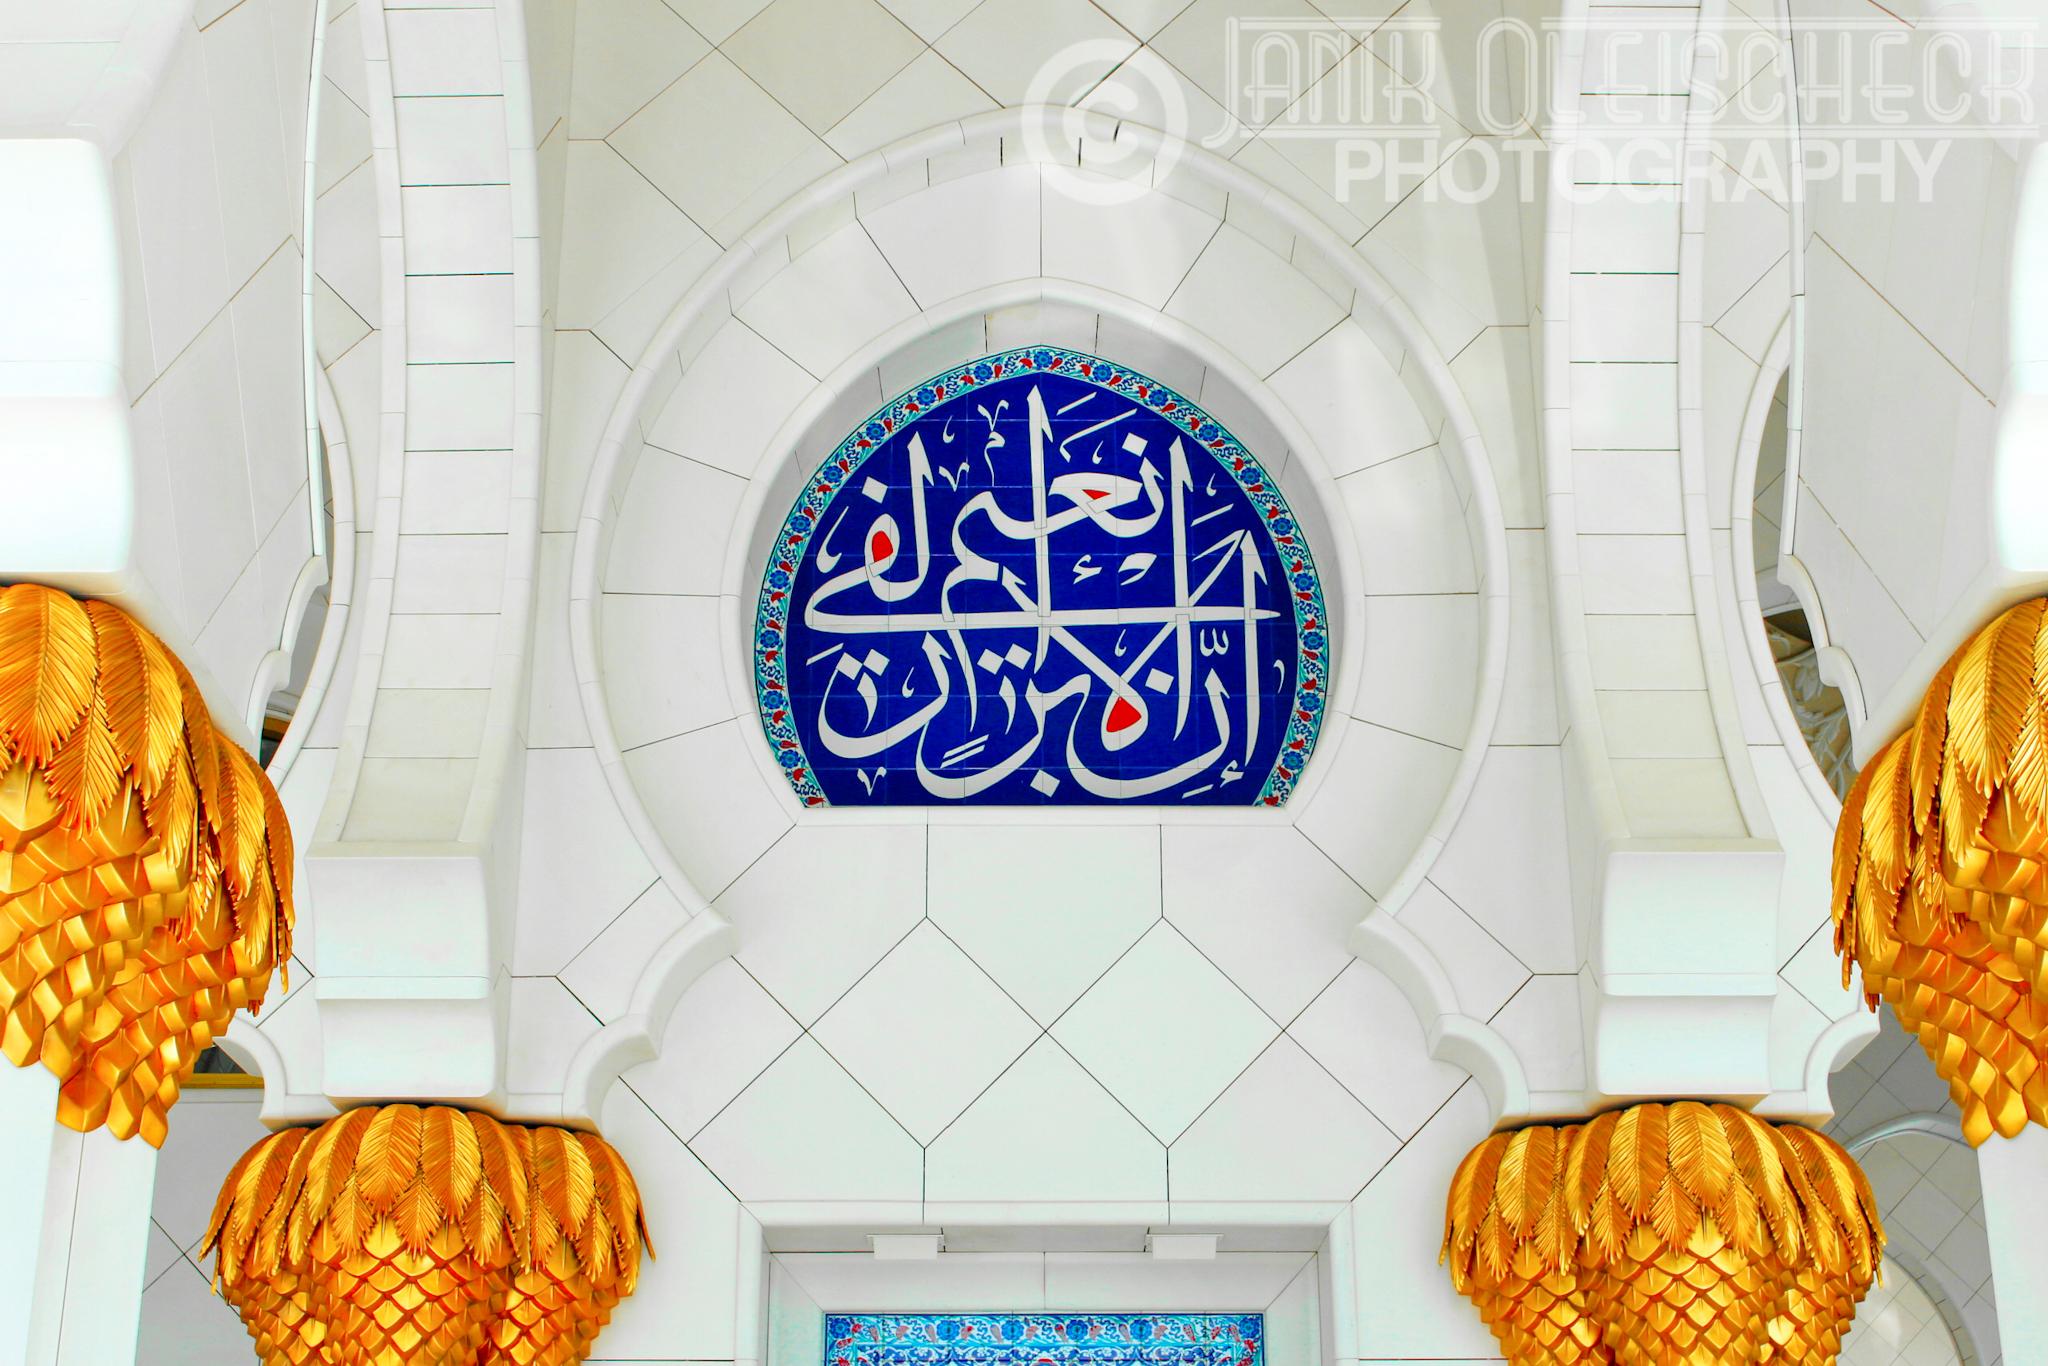 Wall painting at Sheikh Zayed Mosque, Abu Dhabi, United Arab Emirates